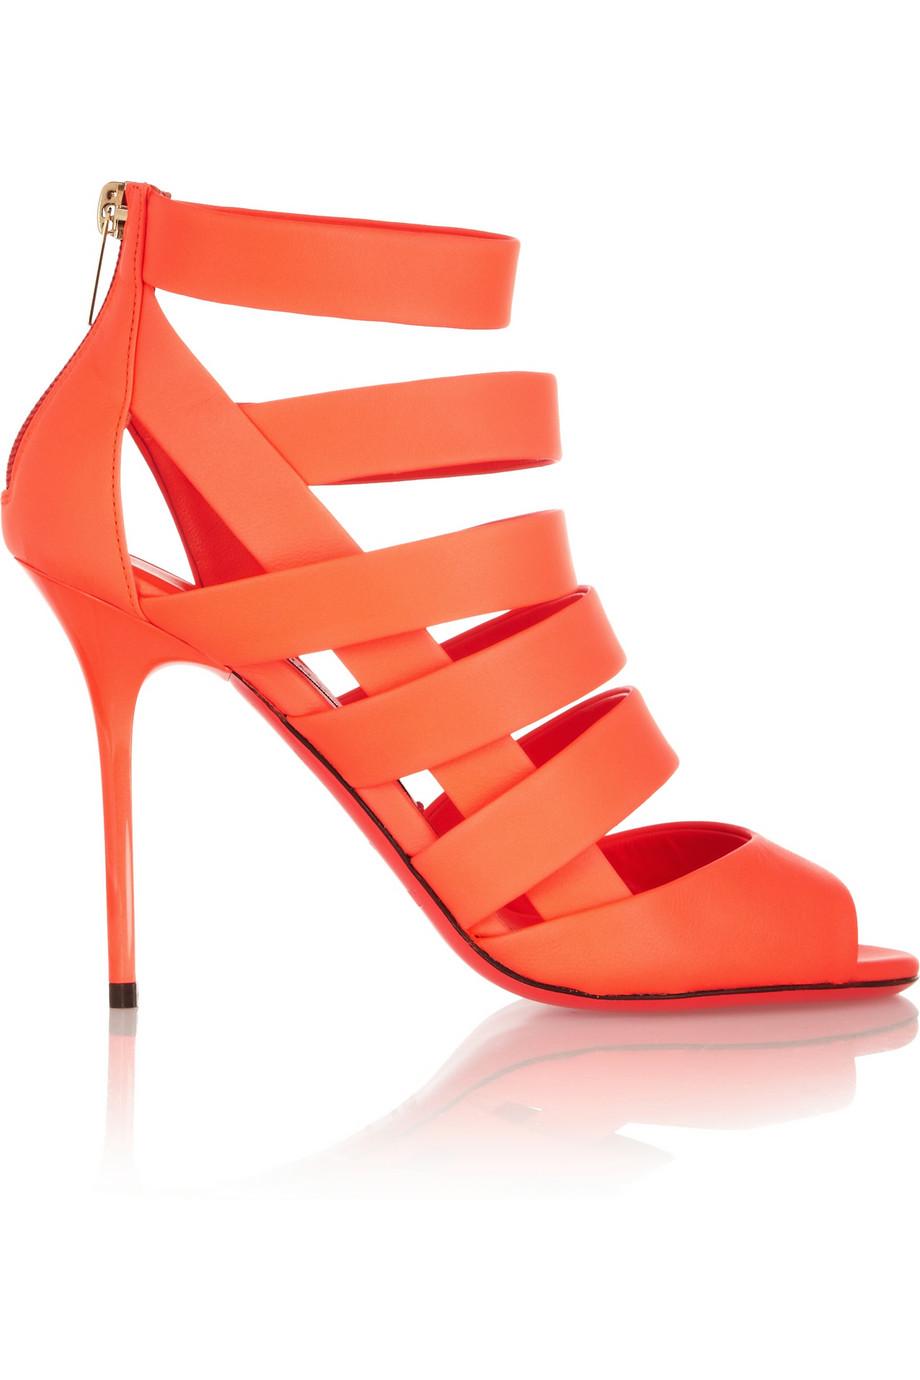 Jimmy Choo Damsen Neon Matte Leather Sandals $547.25